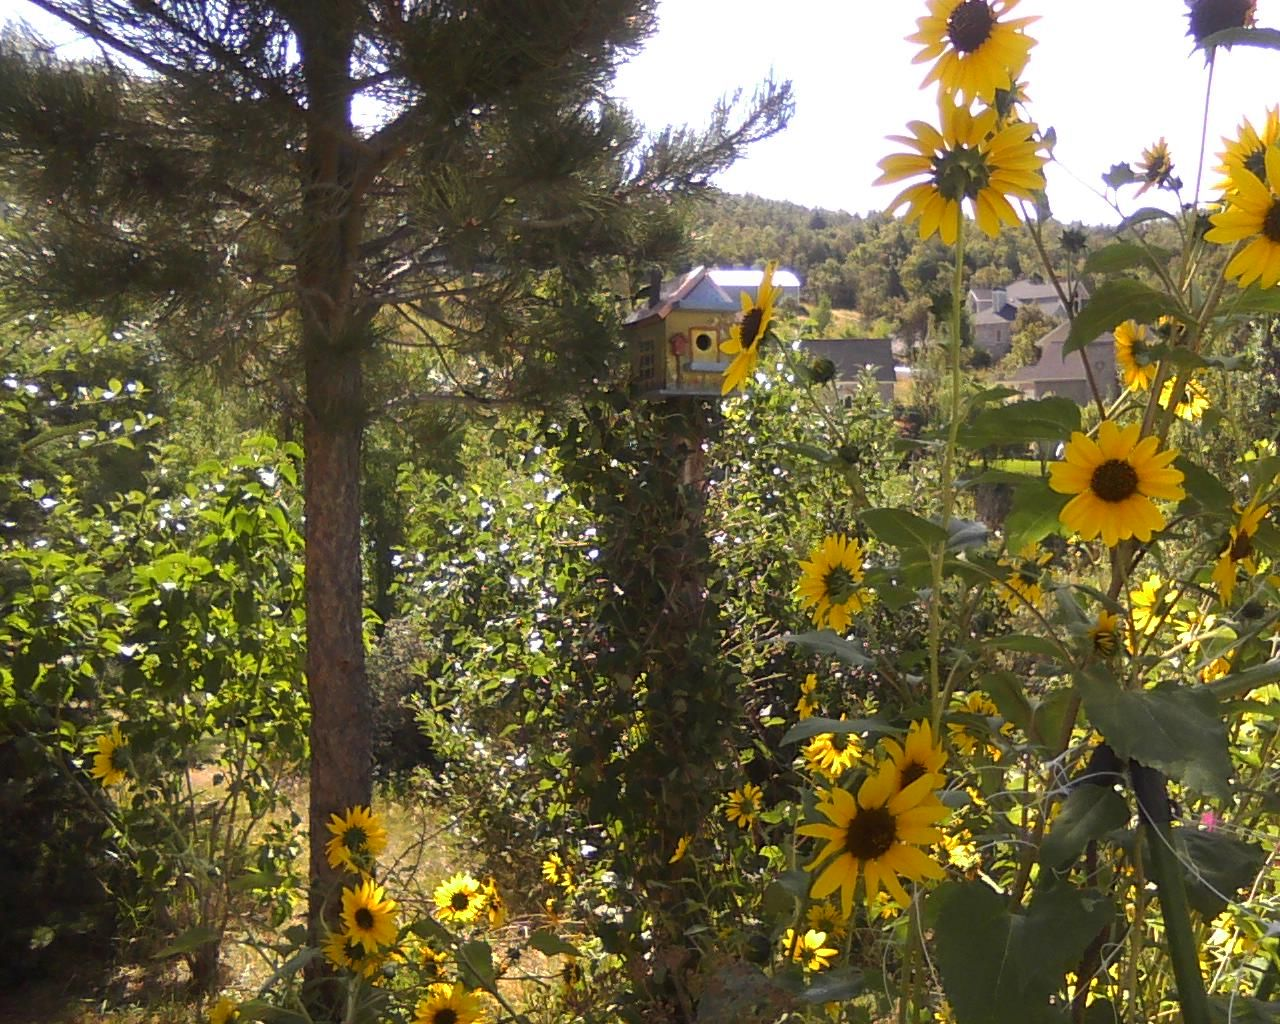 Sunflowers are always fun.